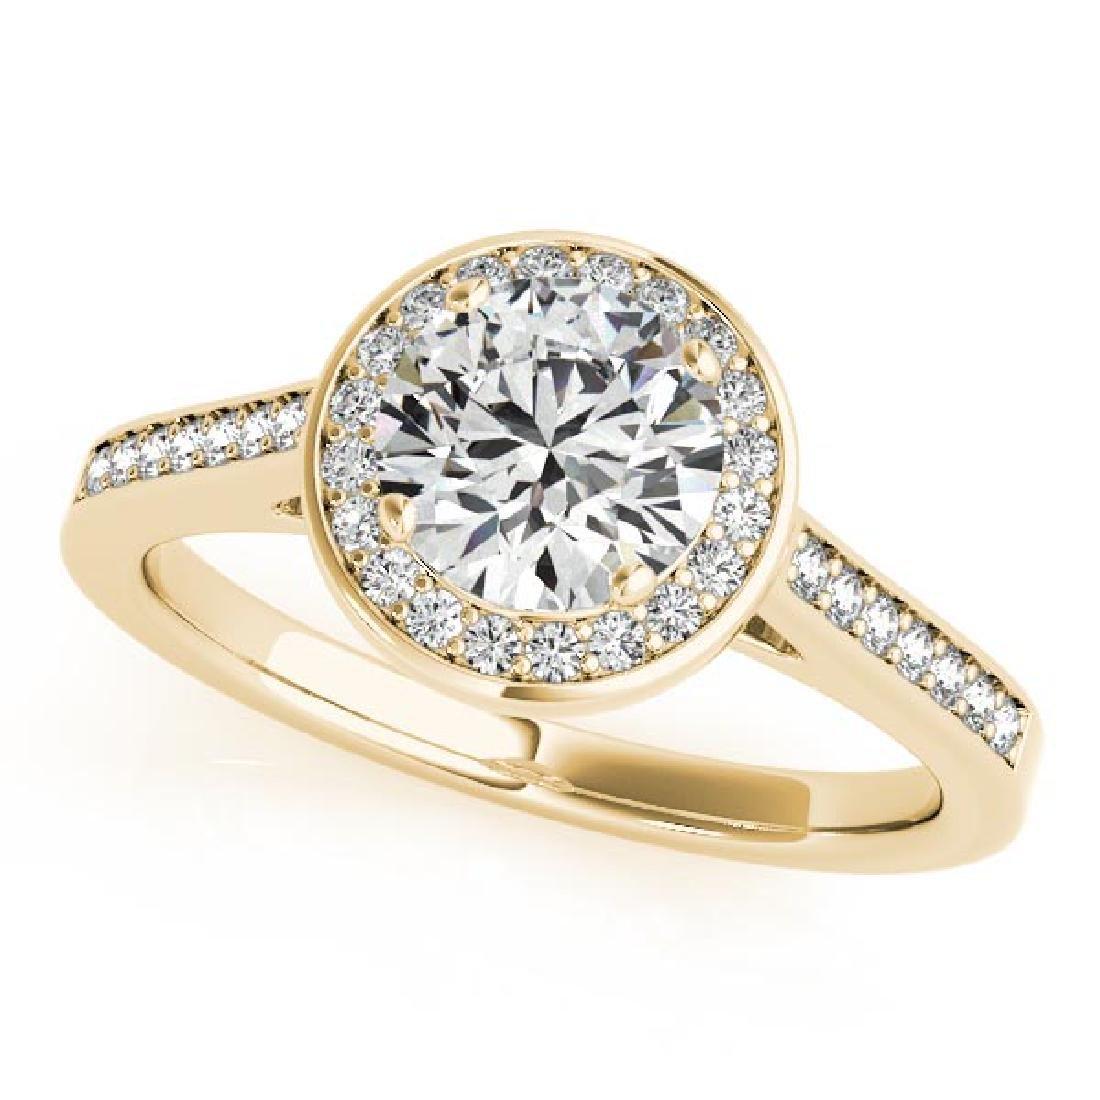 CERTIFIED 18K YELLOW GOLD 1.18 CT G-H/VS-SI1 DIAMOND HA